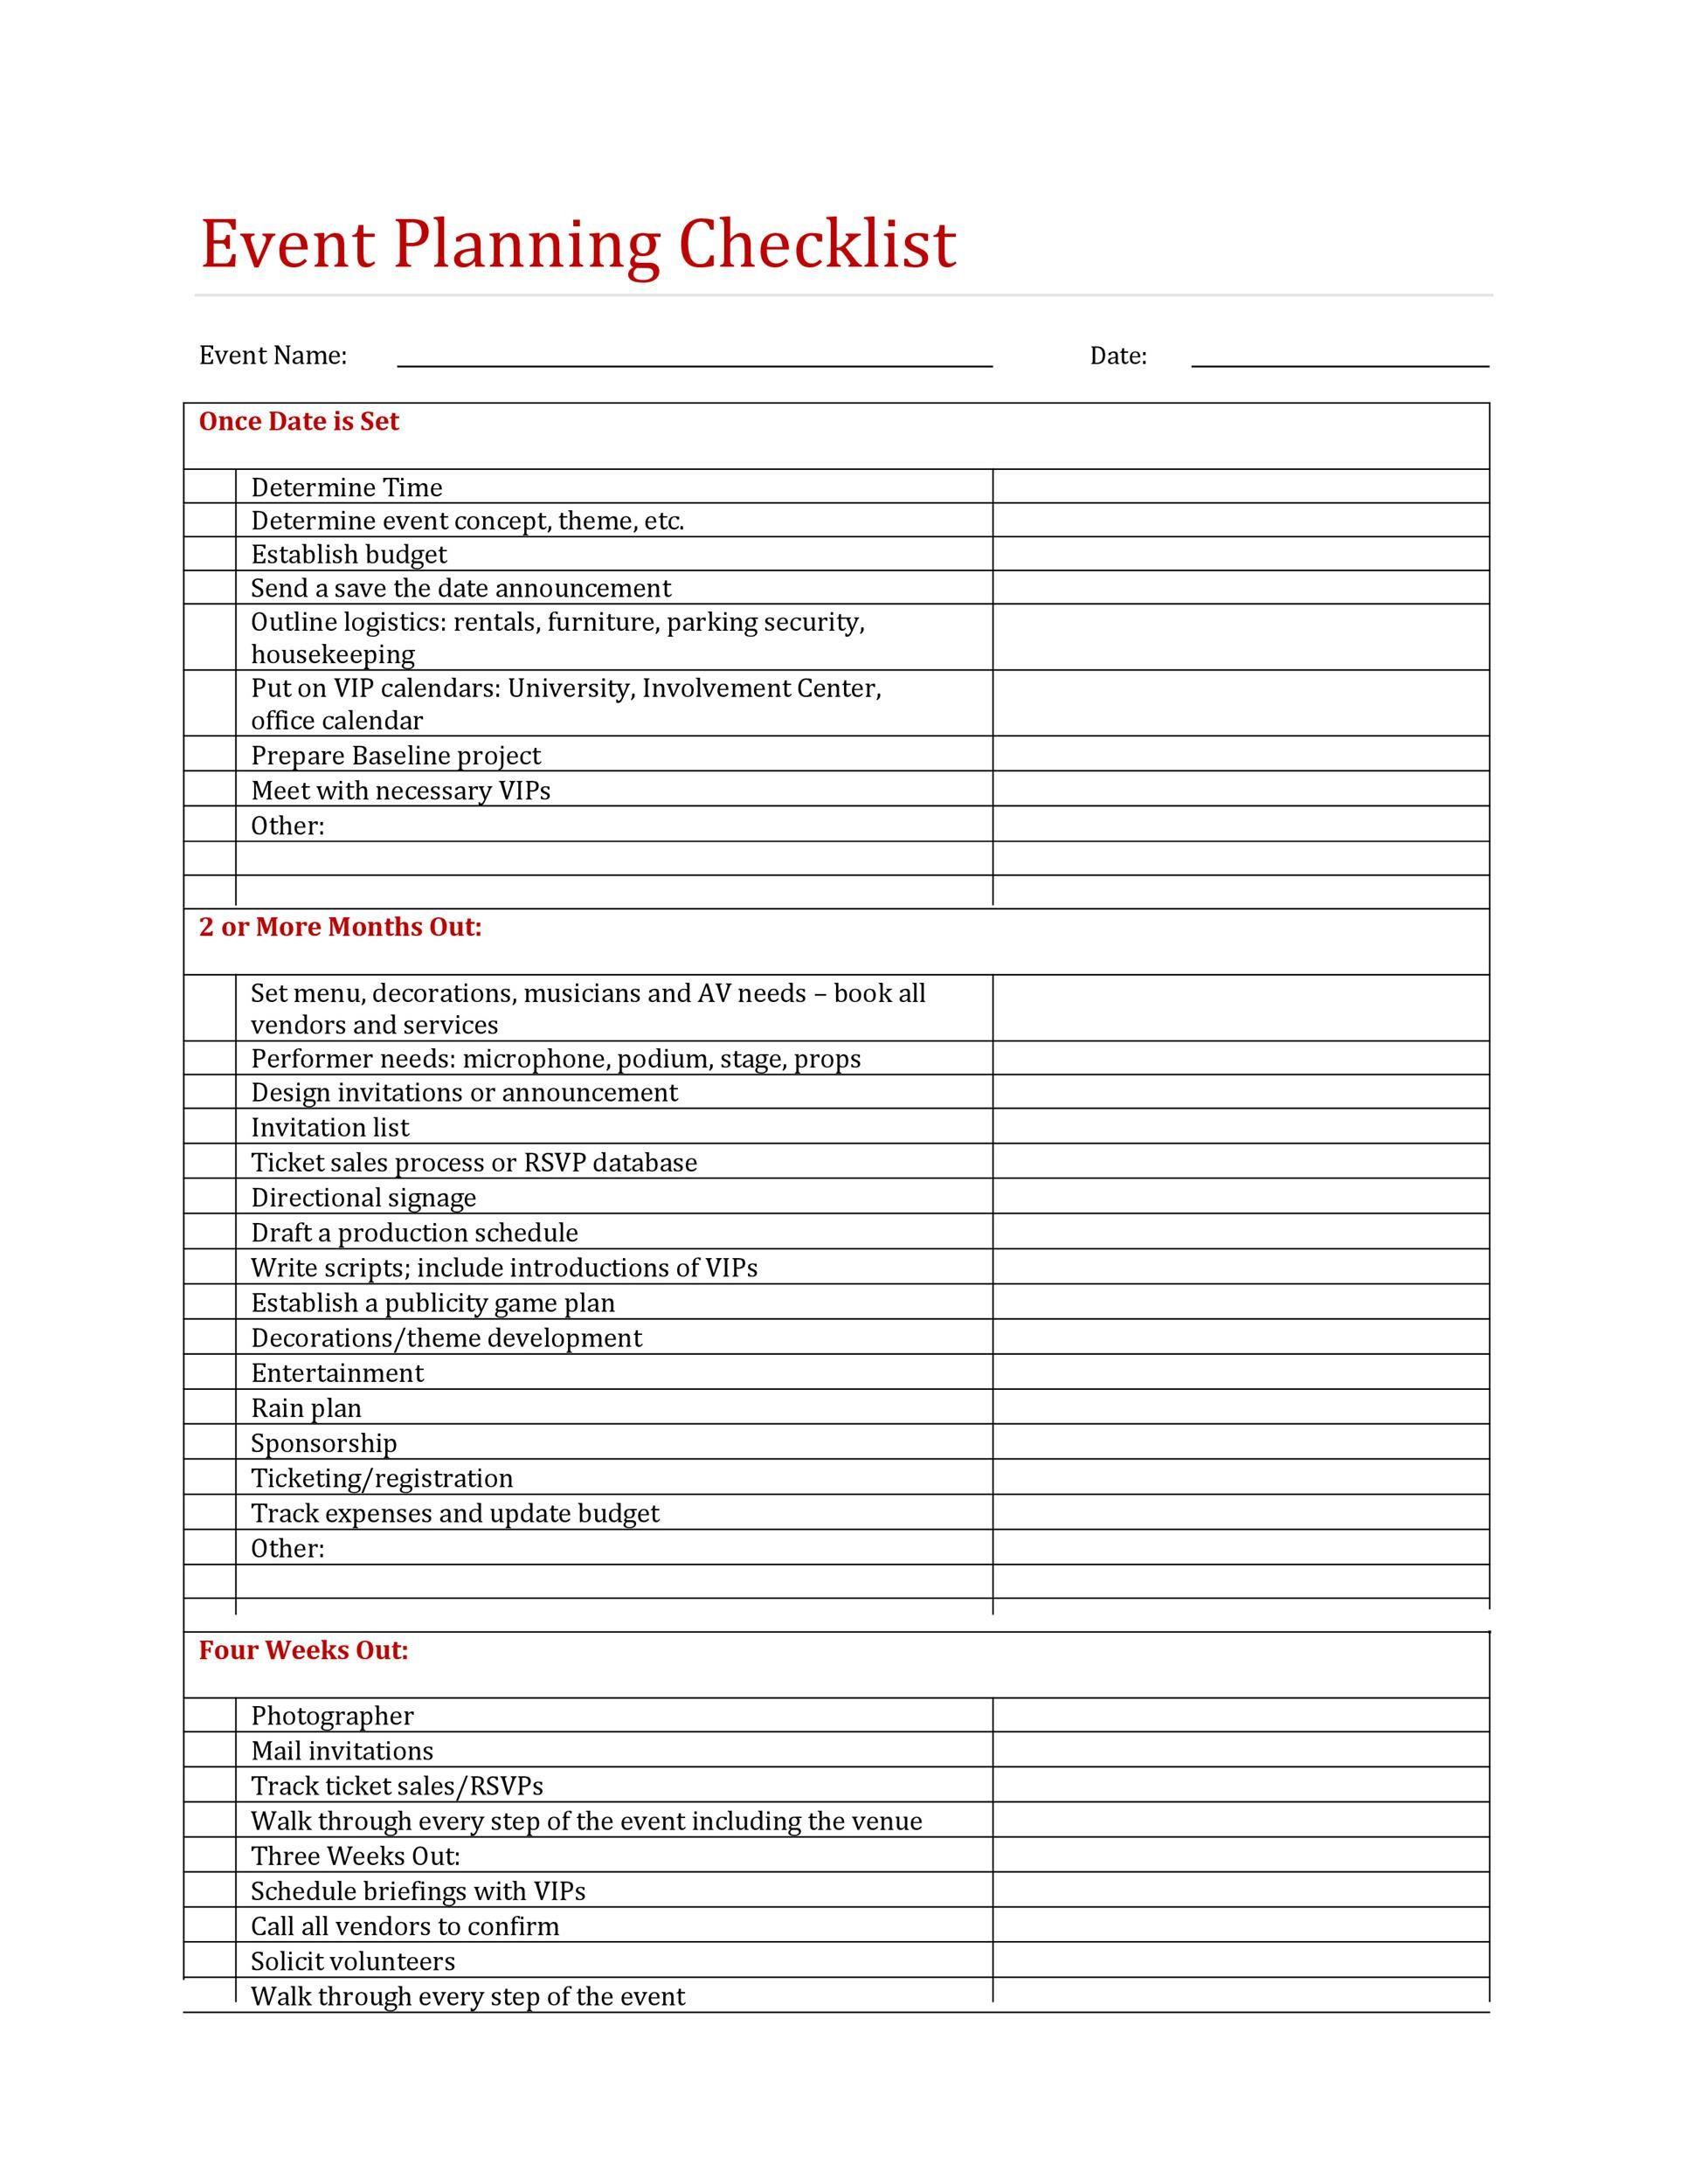 003 Stunning Free Event Planner Checklist Template Idea  Planning PartyFull